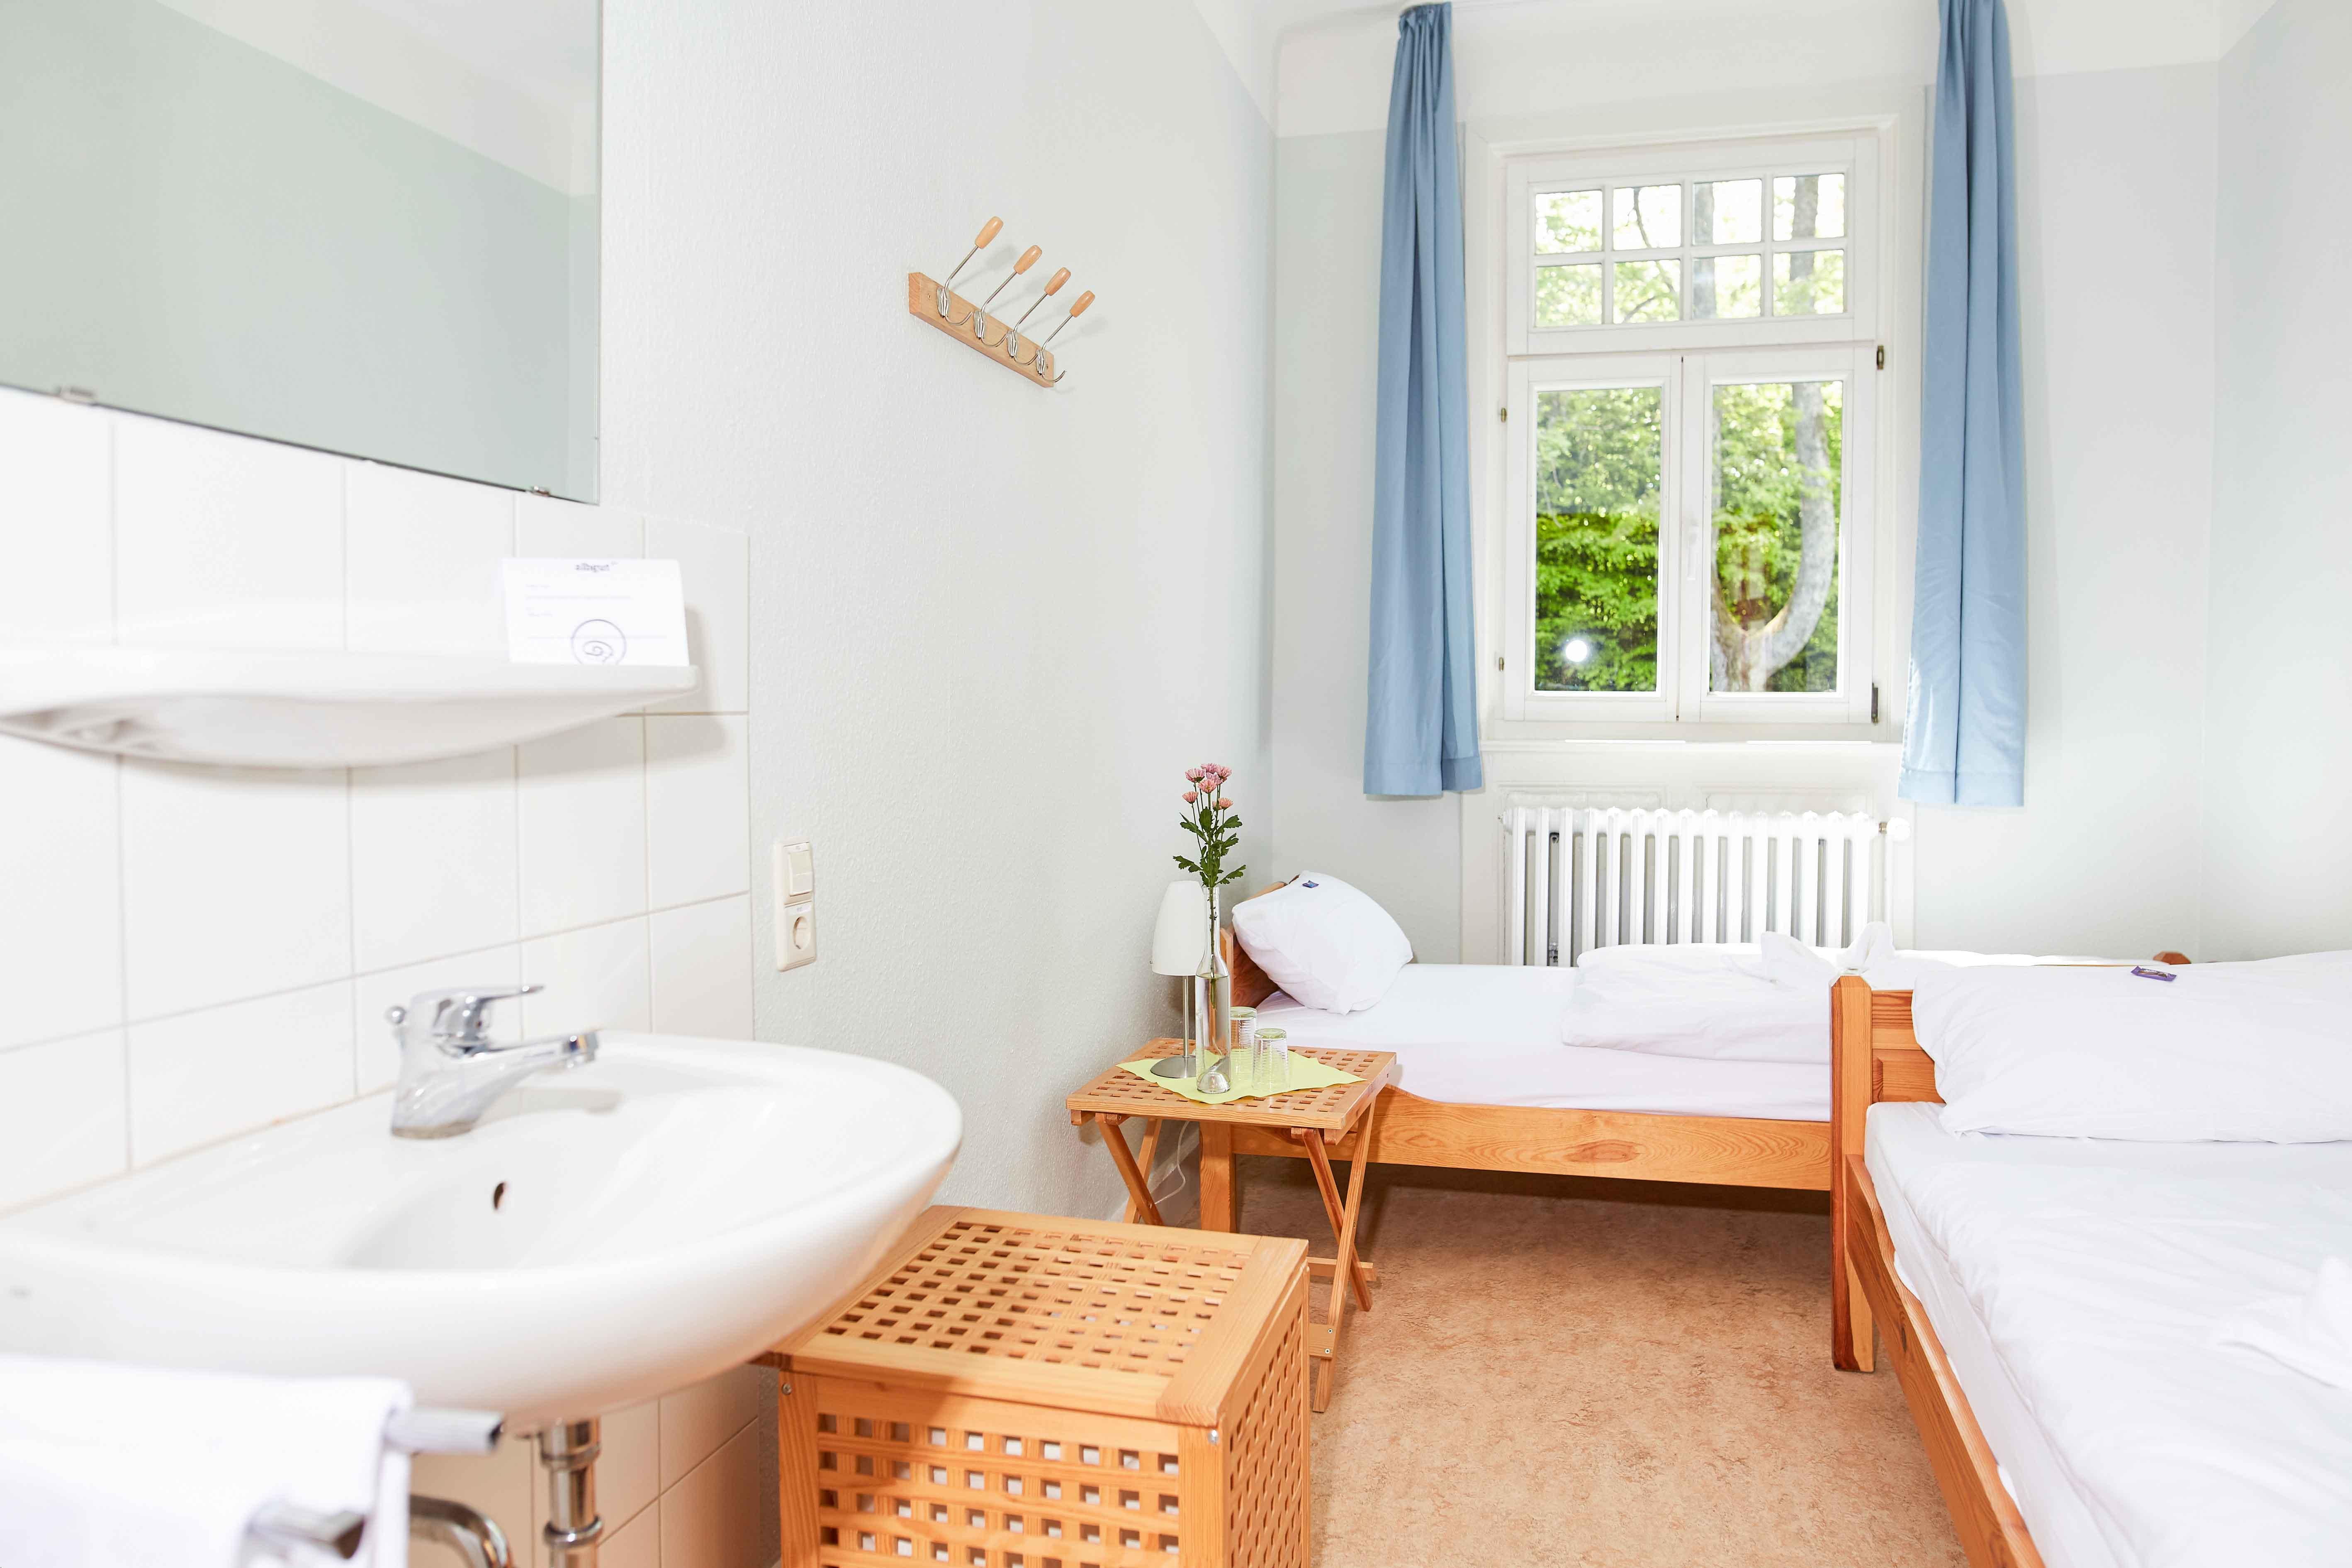 event bernachtung albgut. Black Bedroom Furniture Sets. Home Design Ideas